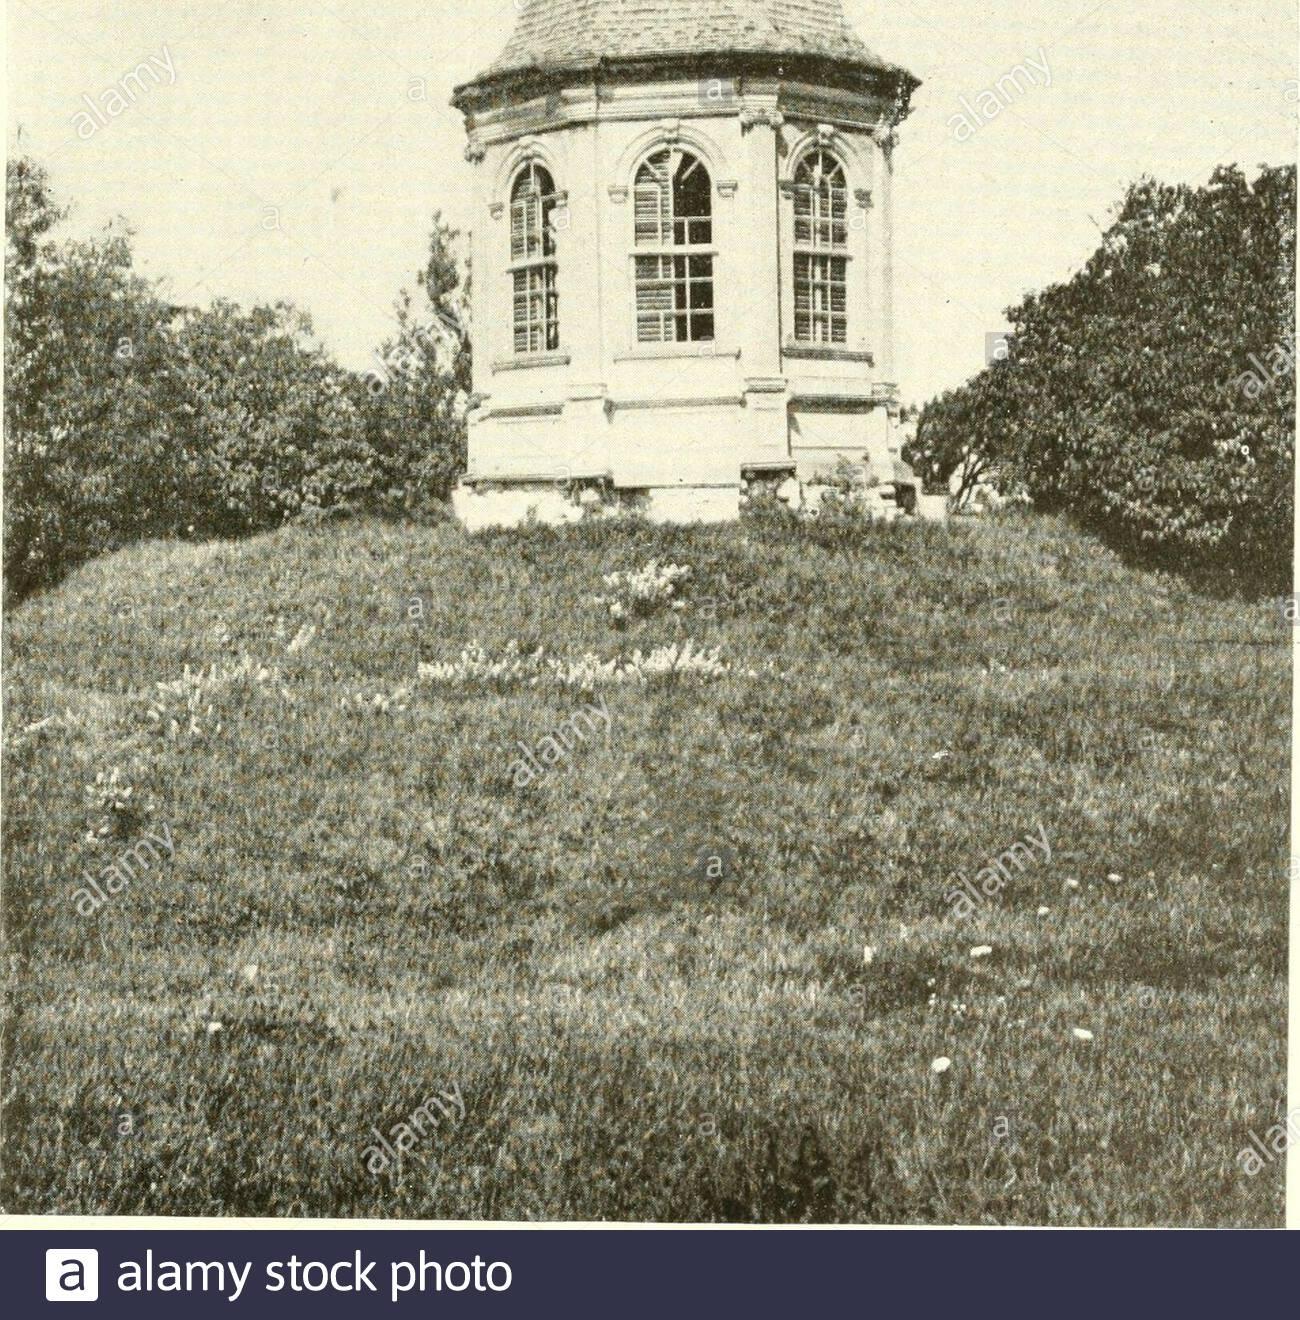 the livable house its garden gazebo of the royall house at medford massachusetts 167 t h c l i v a b i e h o u s e 2AXC6BY